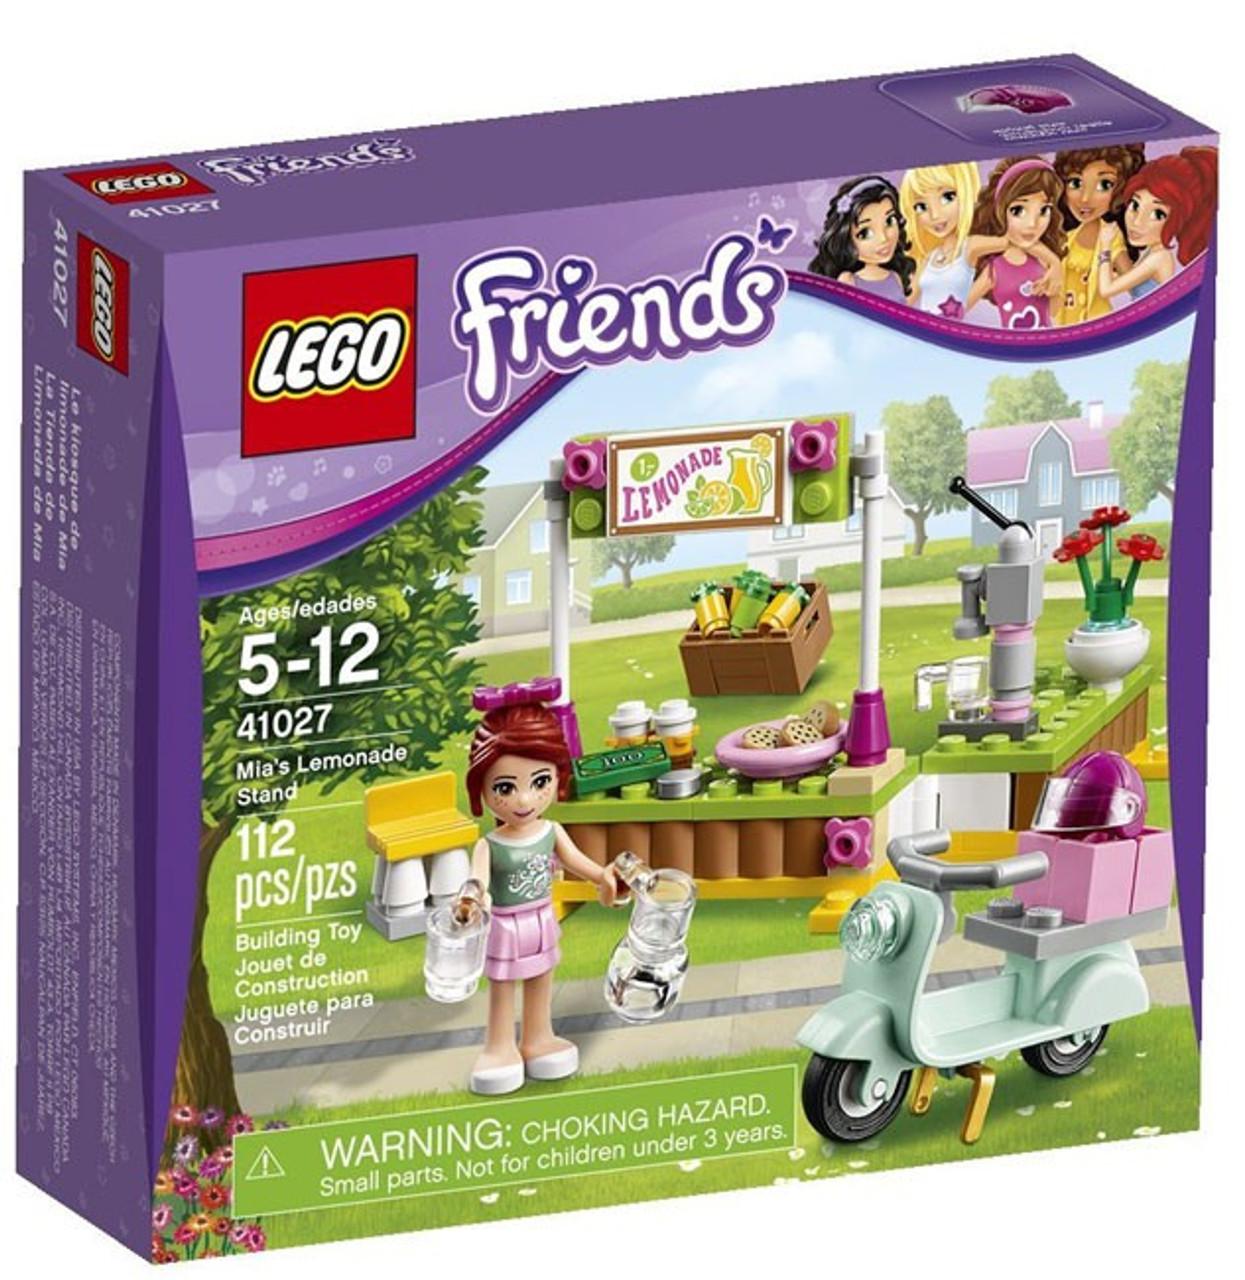 Toywiz Mias Lemonade Friends Stand 41027 Lego Set 7fIbmygY6v